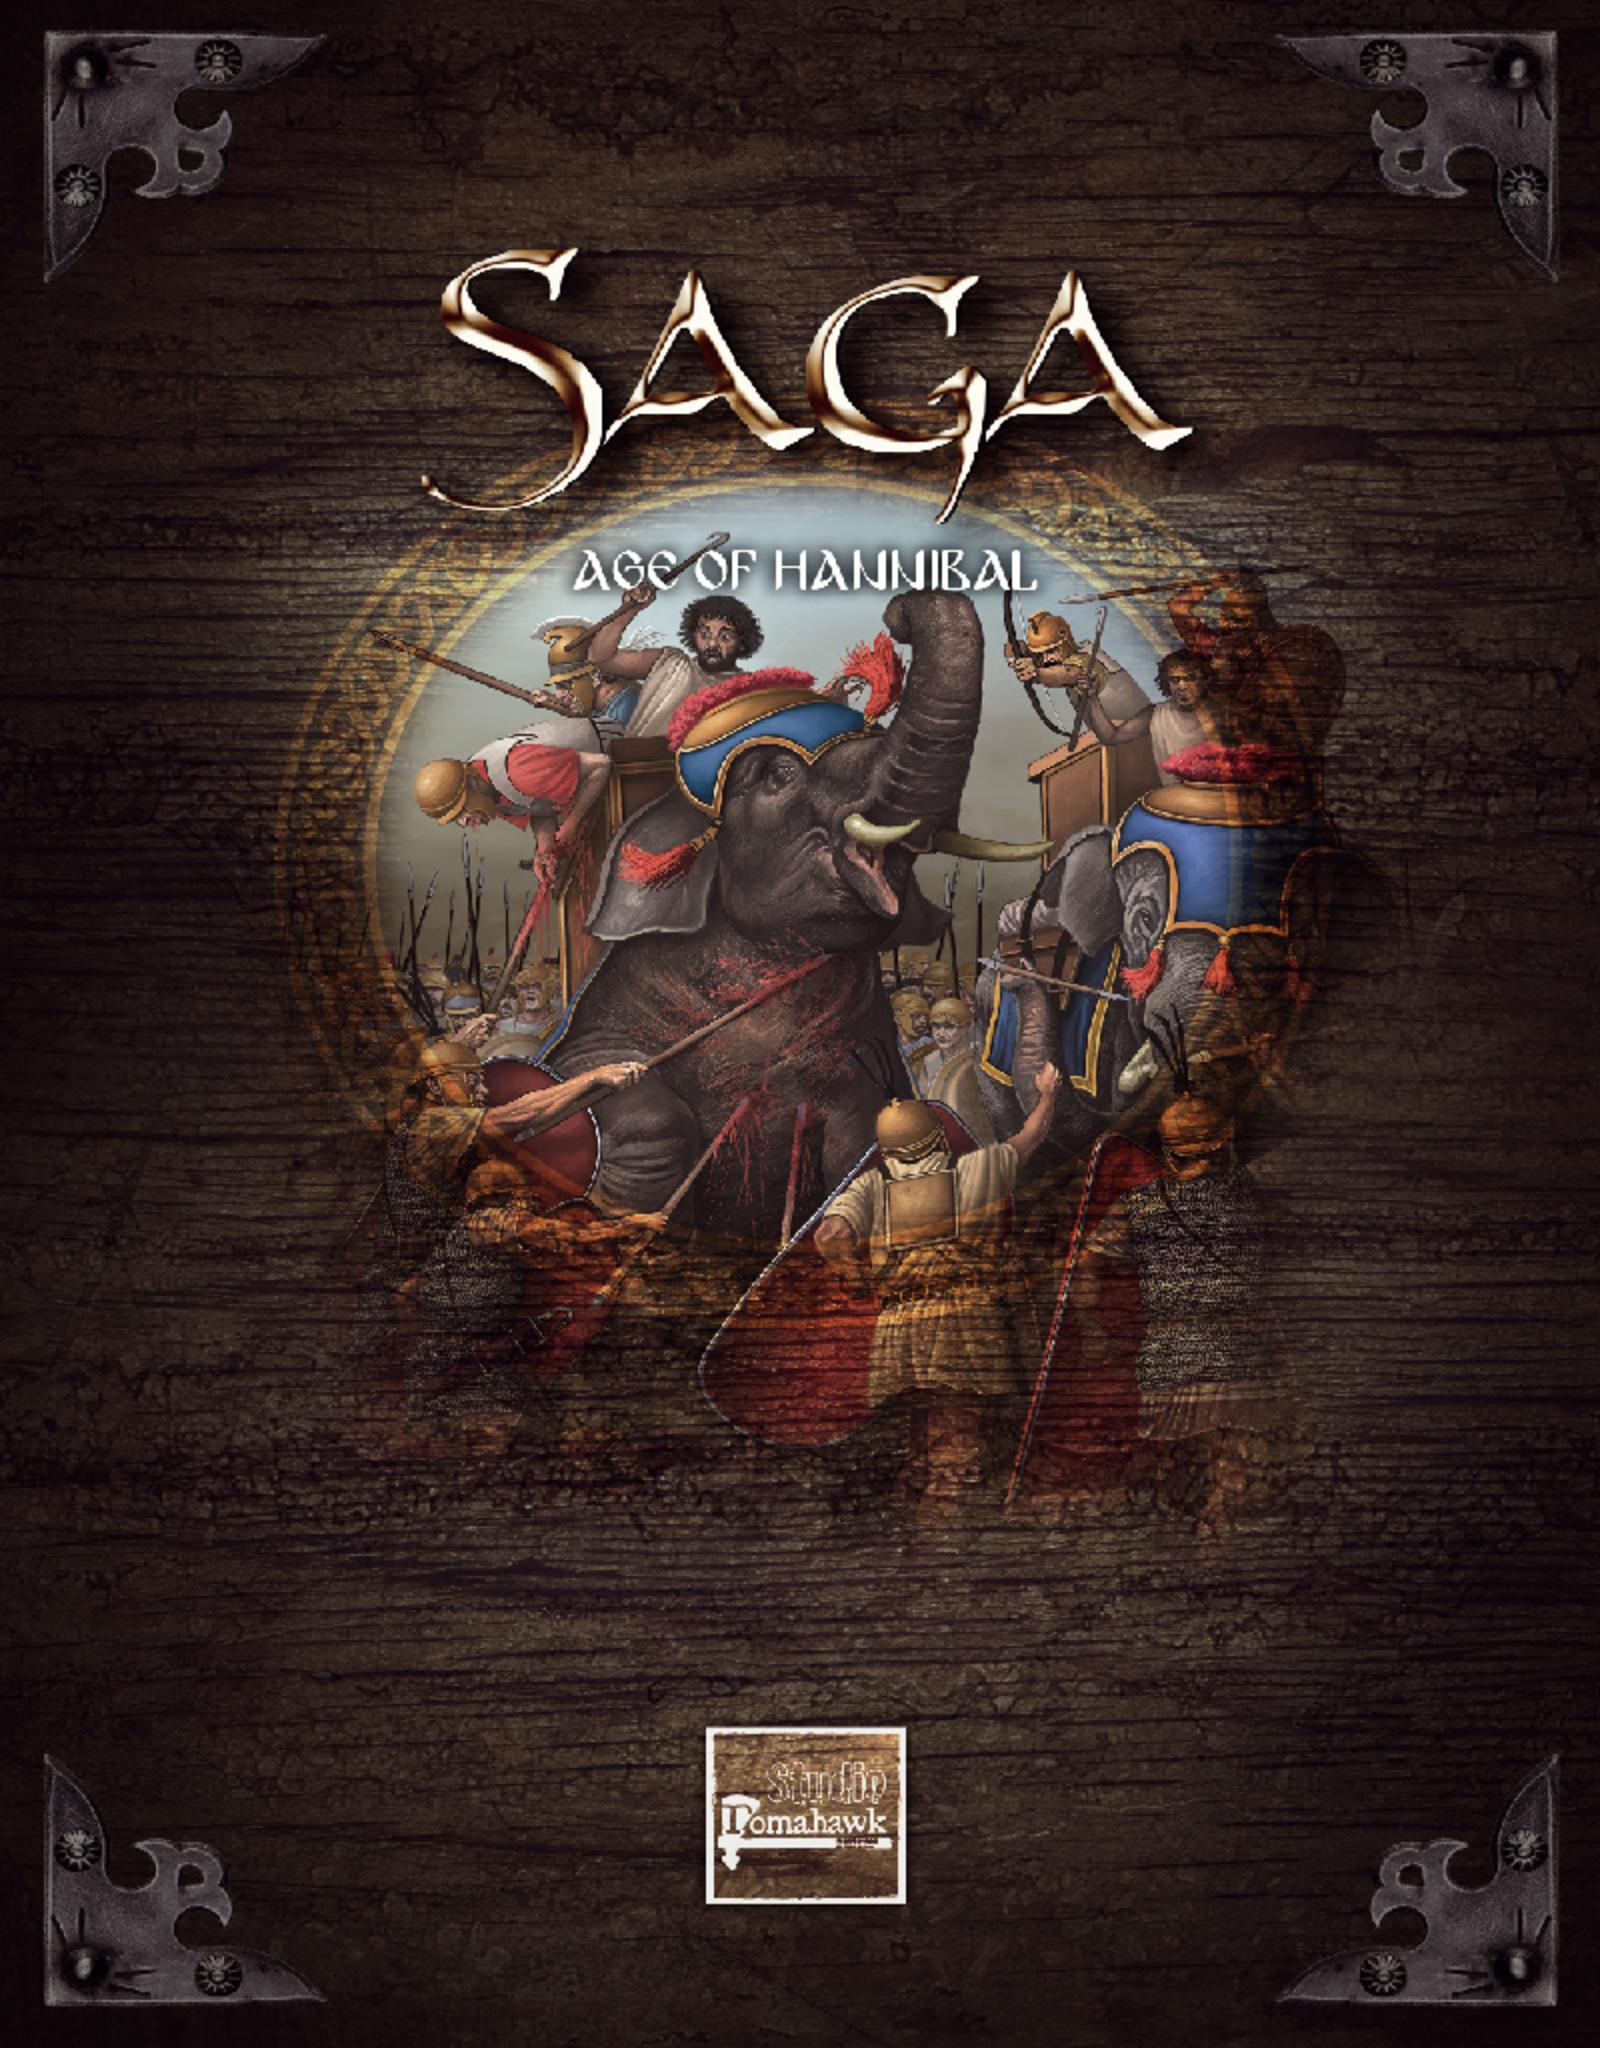 Studio Tomahawk Saga- Age of Hannibal